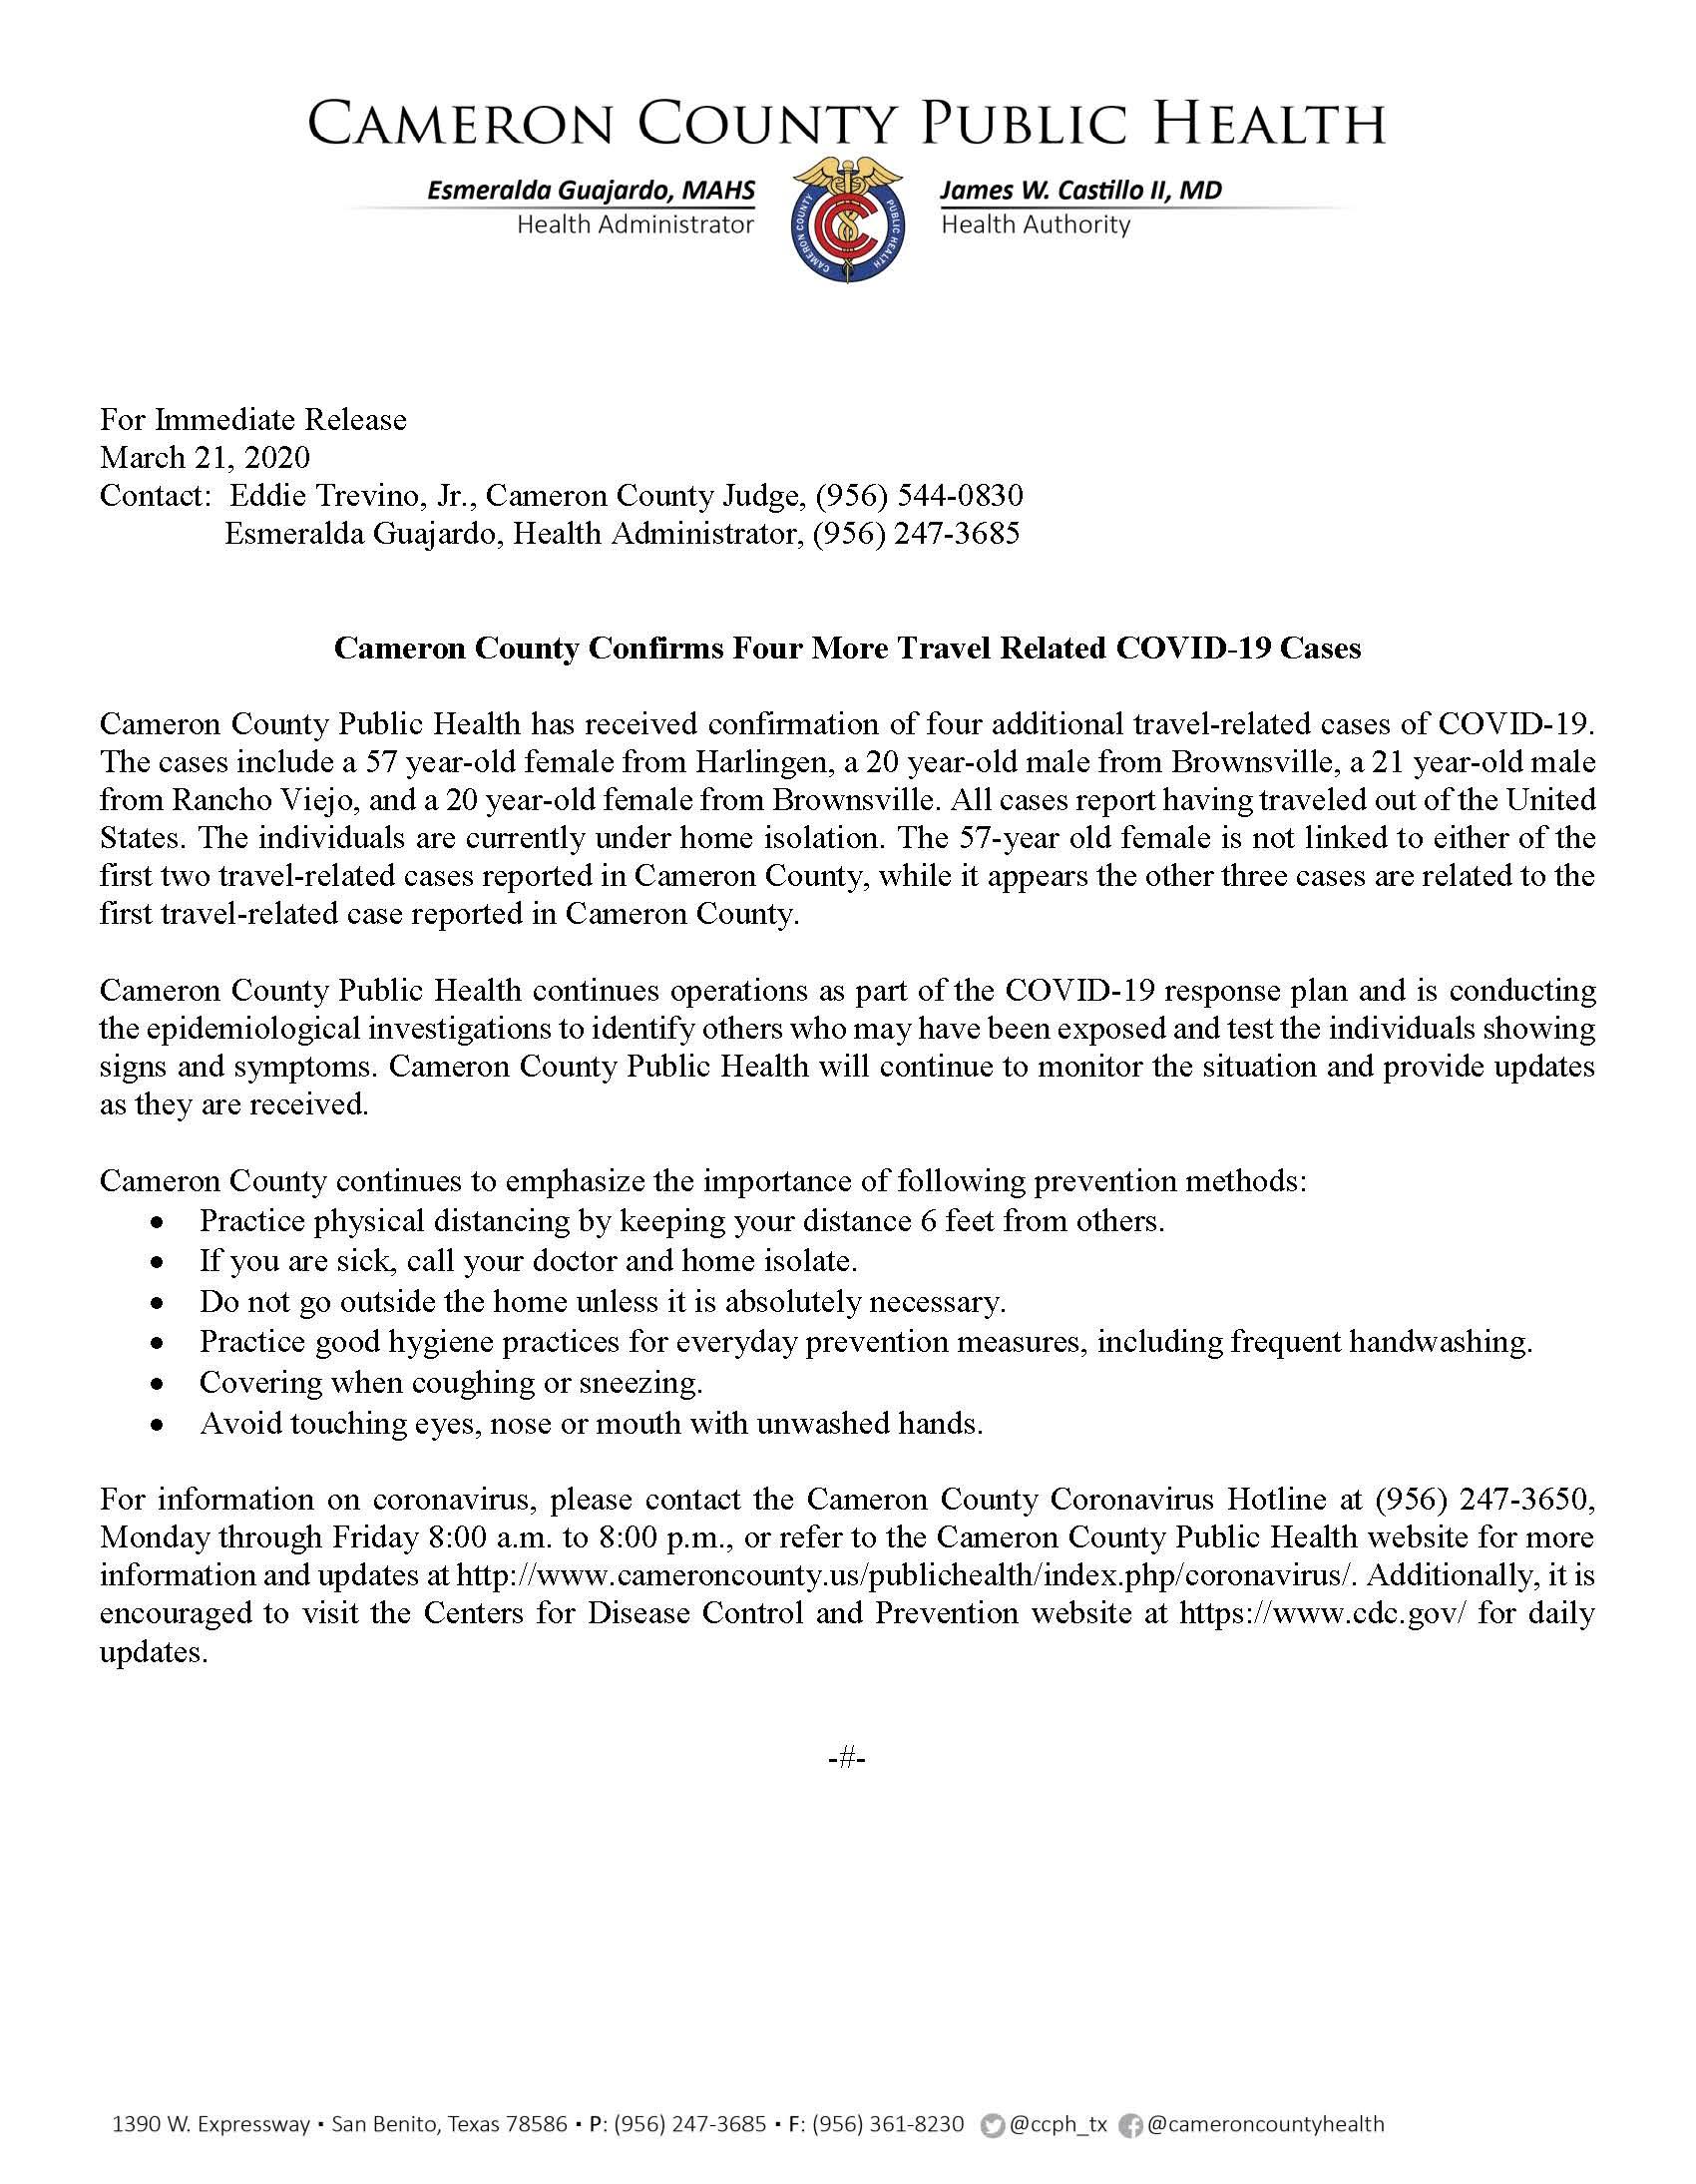 COVID 19 Press Release Addlt 4 TRC 3.21.2020